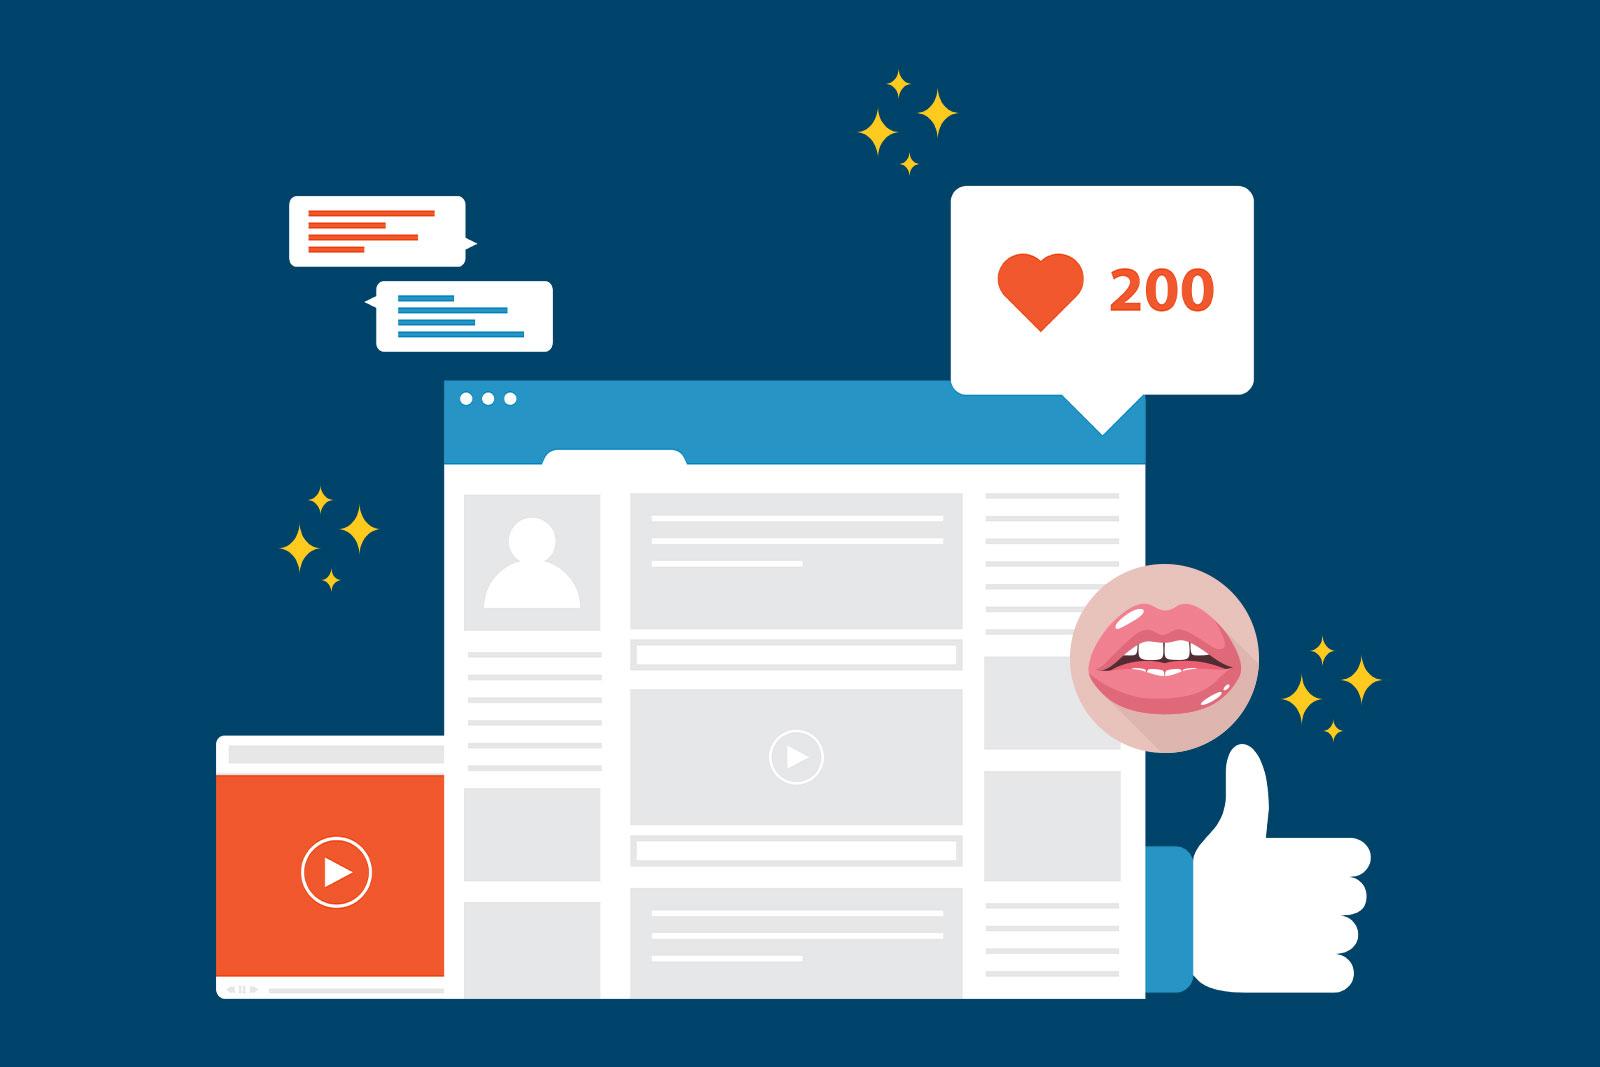 The Kardashian's Guide to Smashing Social Media: What's The Secret?